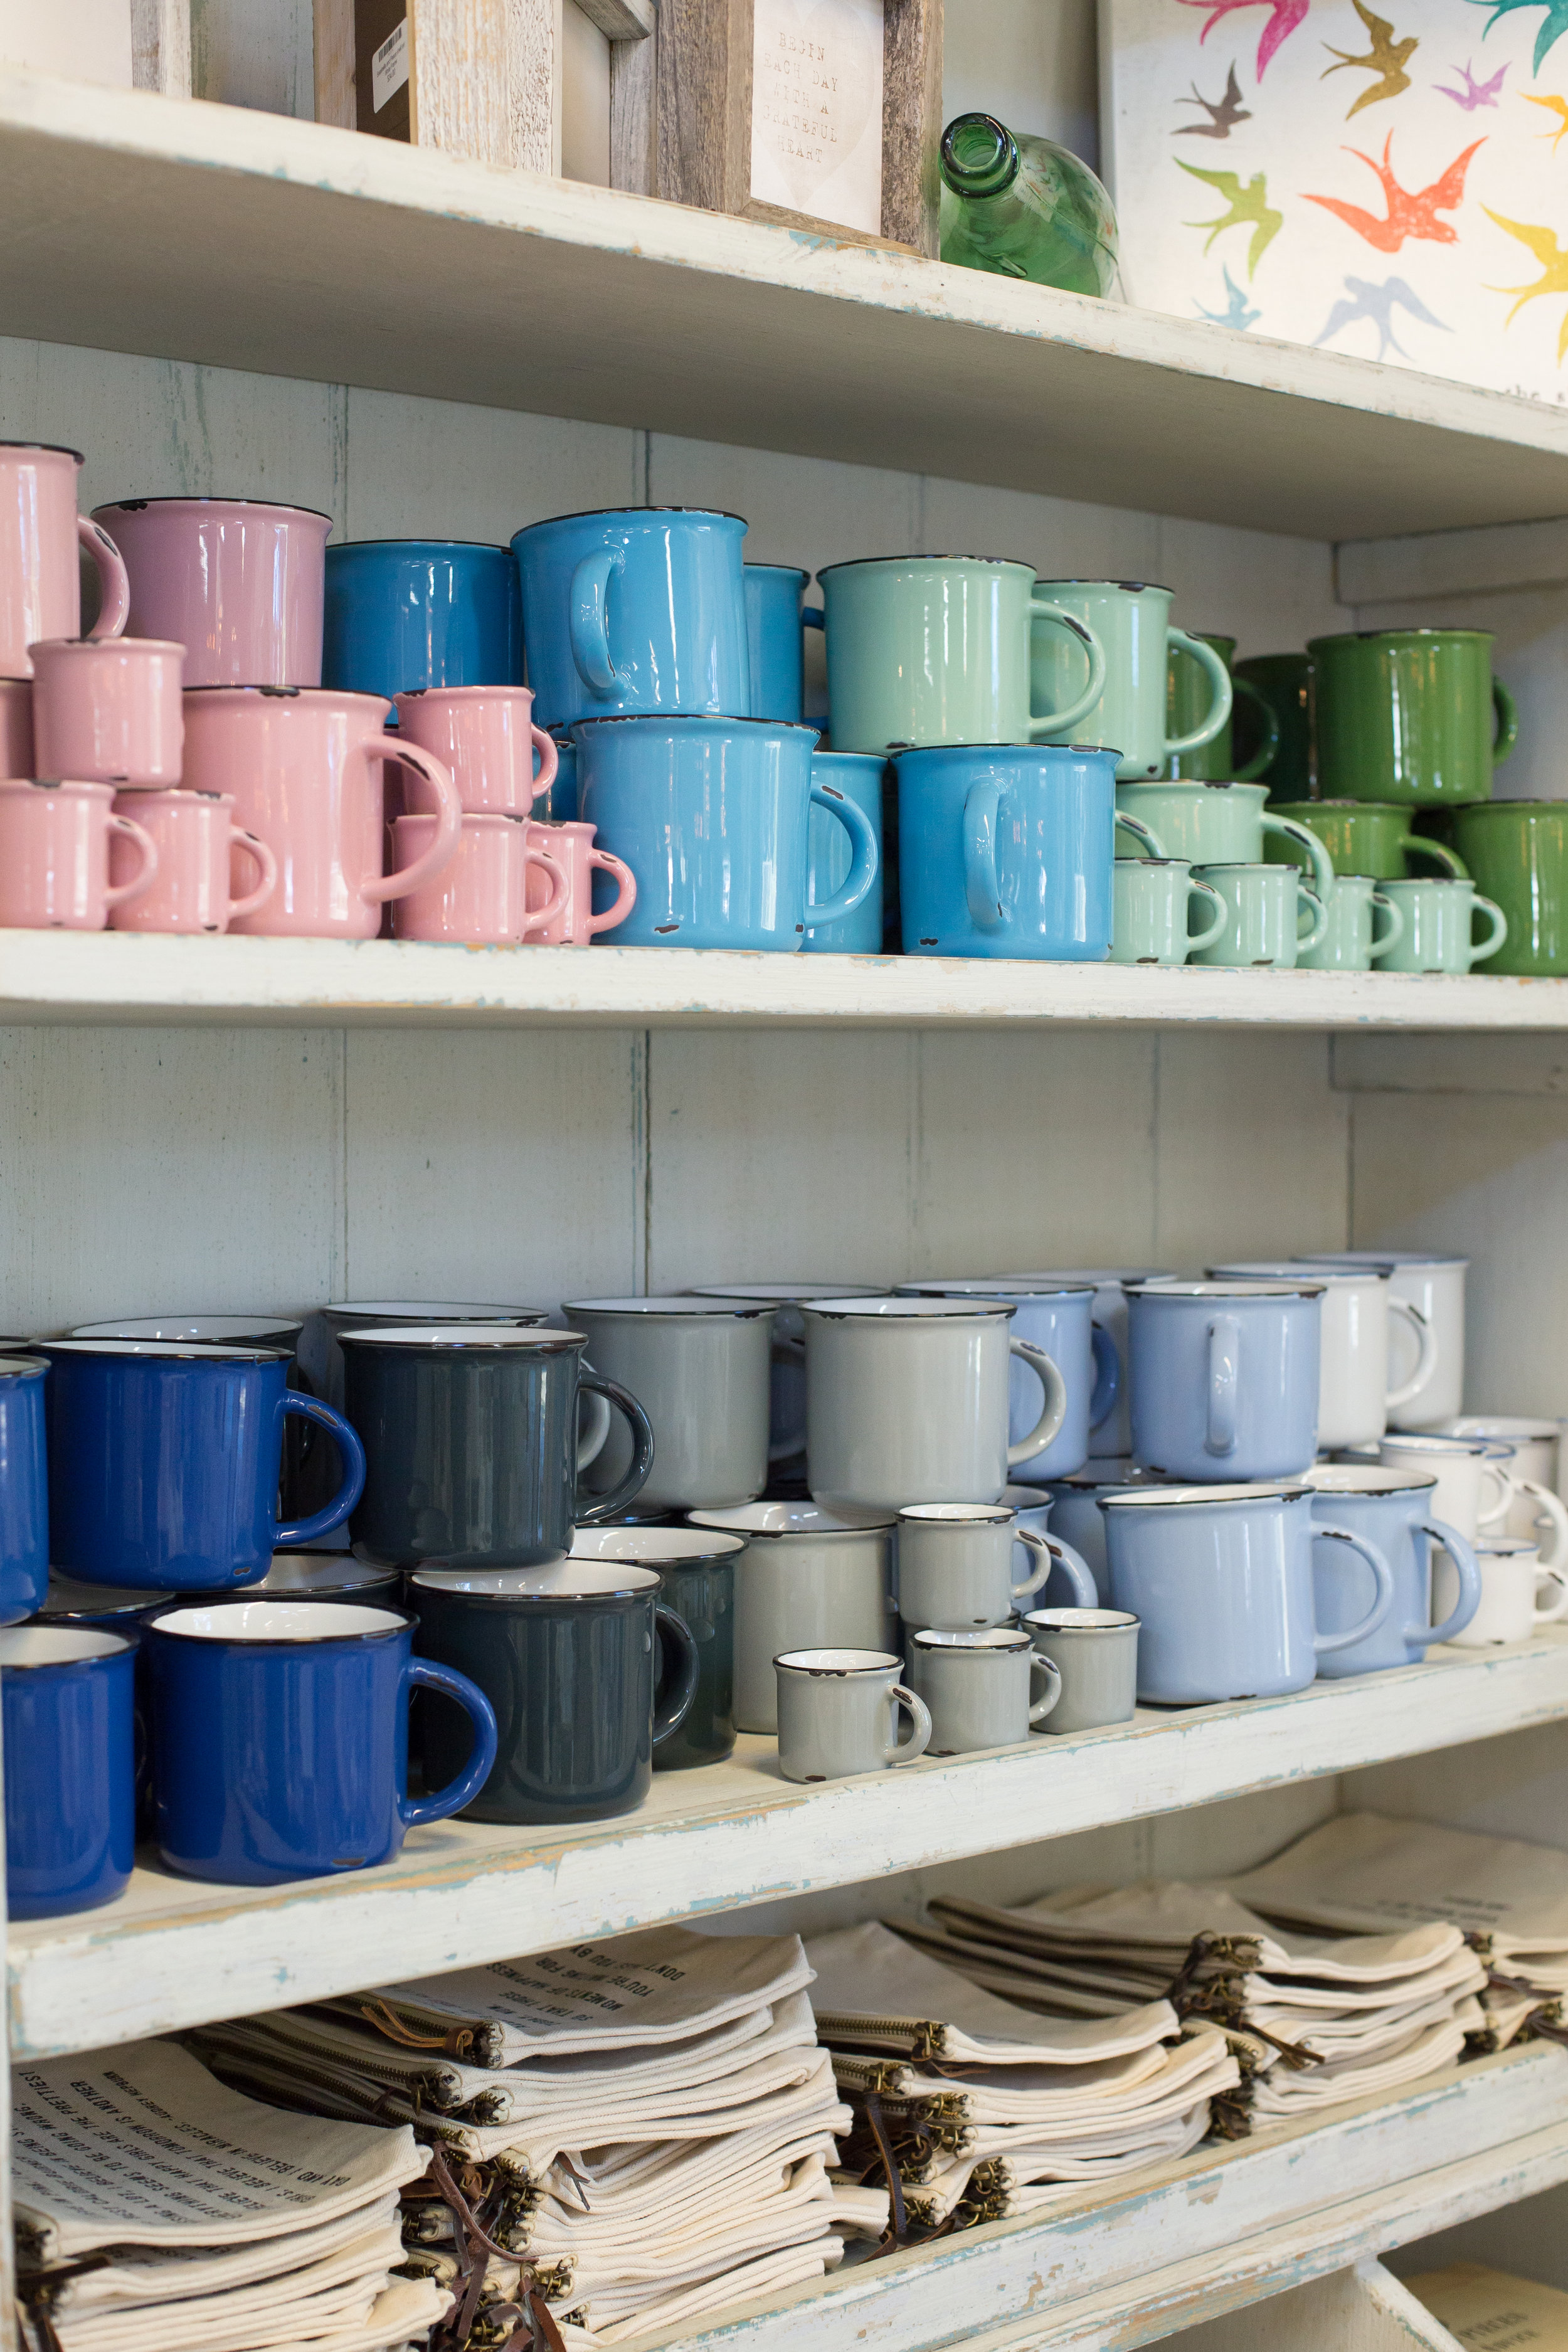 Camping mugs, kitchenware